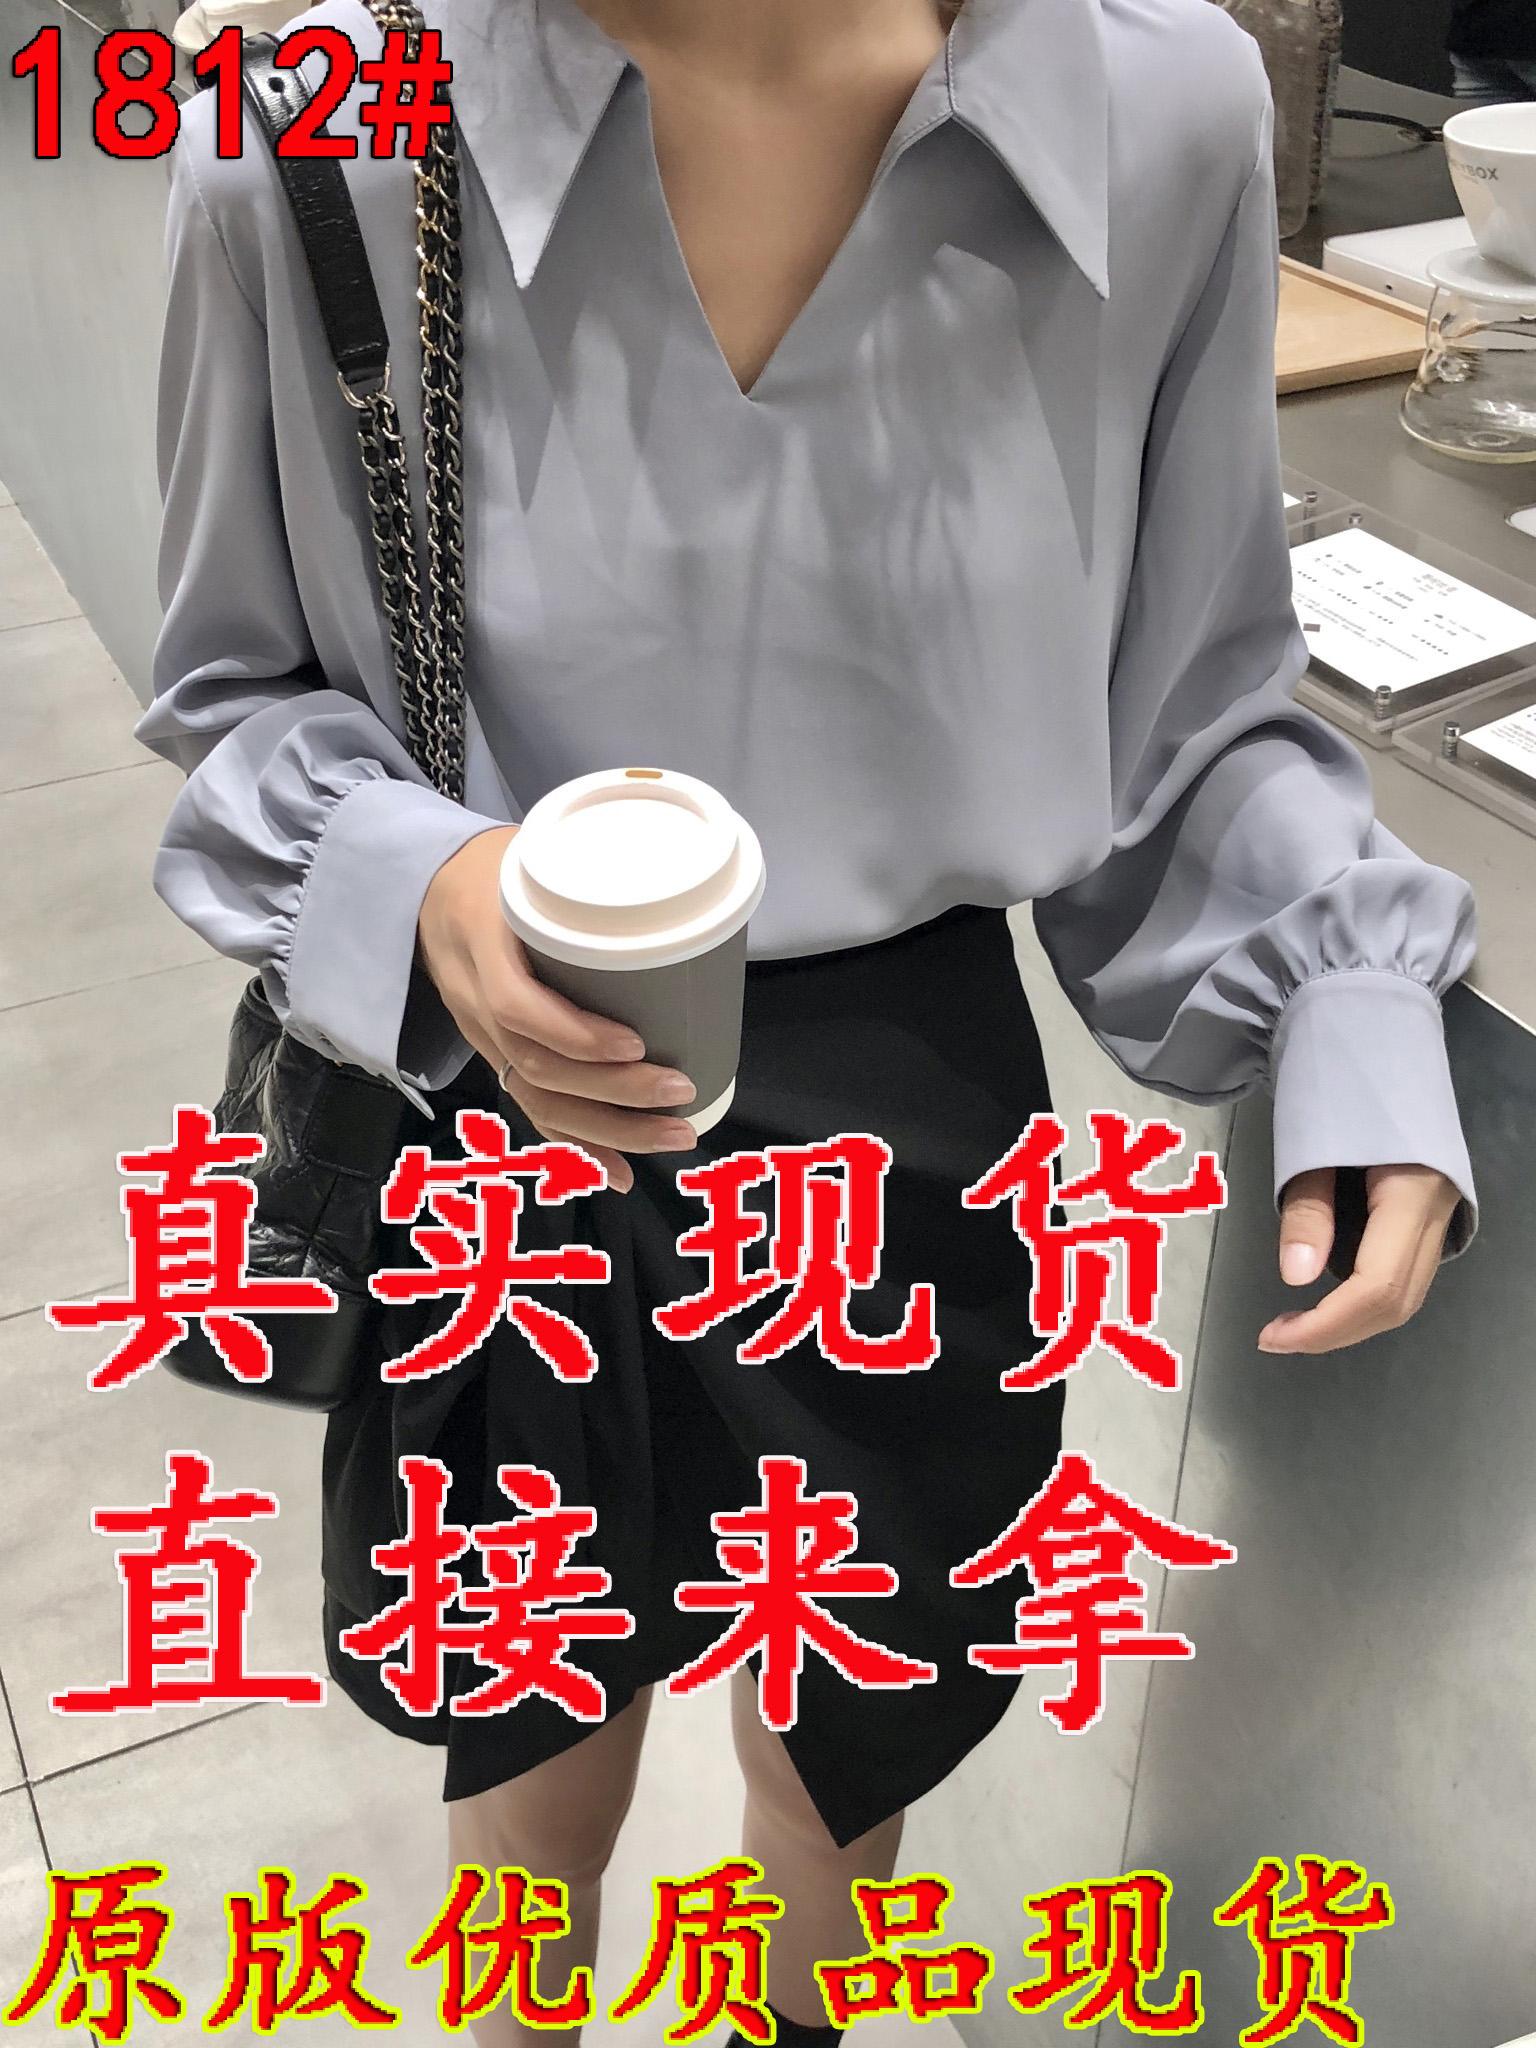 chic早秋上衣女長袖港味霧霾藍襯衫韓范網紅襯衣女社會2018新款潮